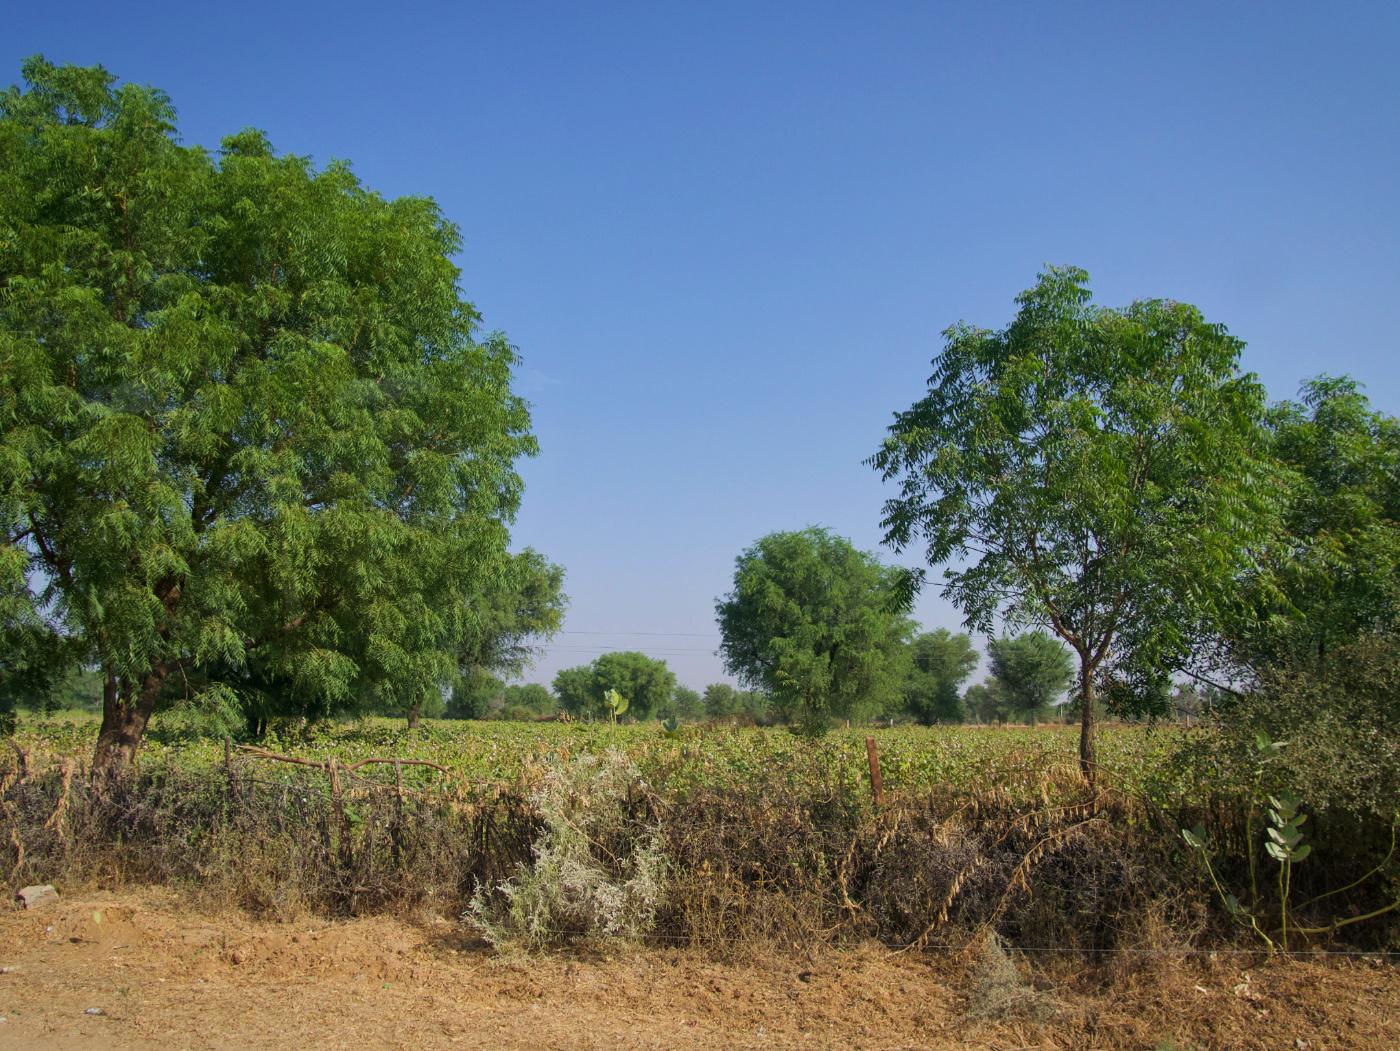 473-India-TharDesert